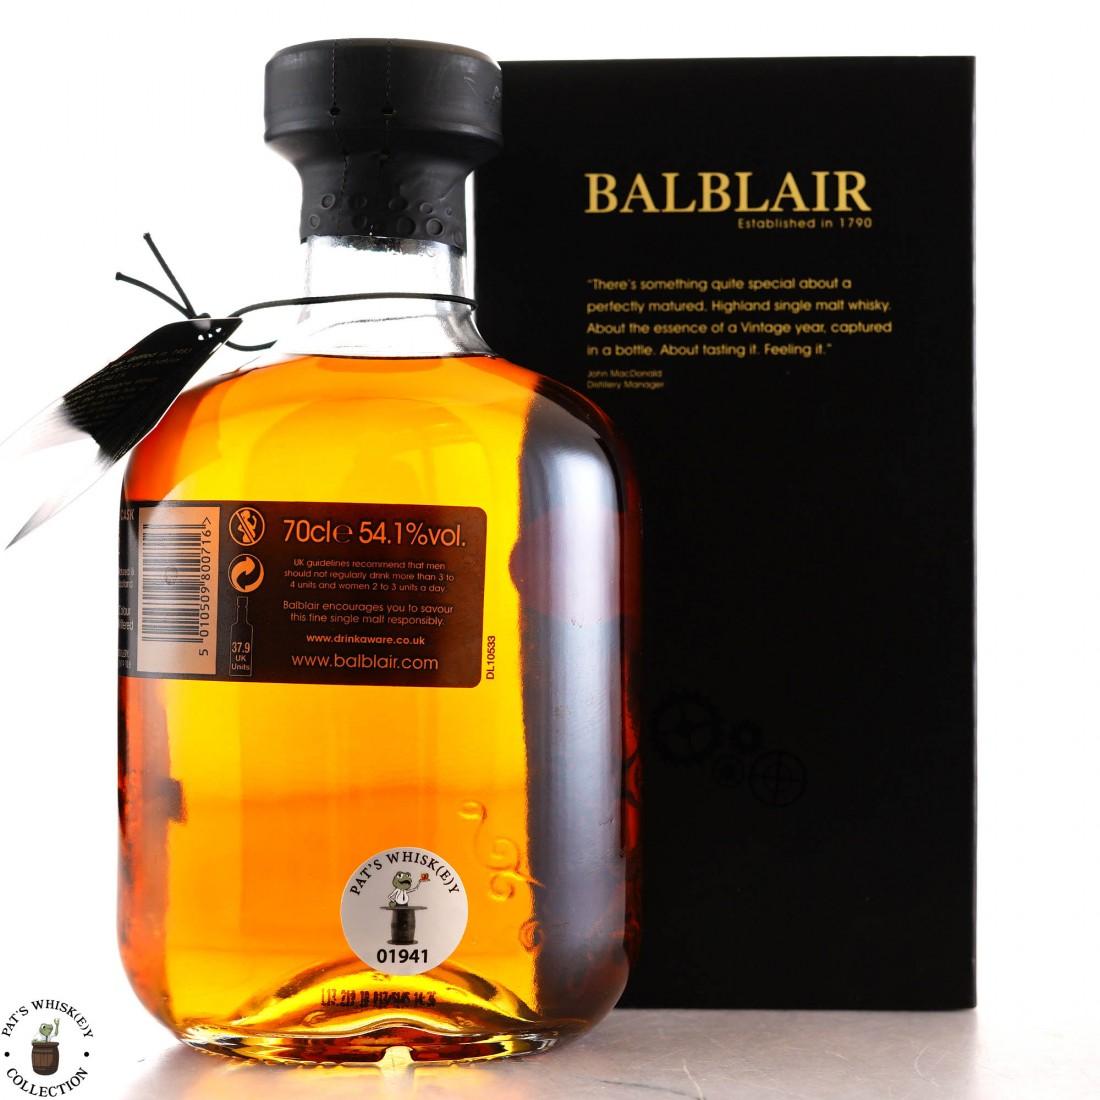 Balblair 1983 Single Bourbon Cask #1252 / World of Whiskies